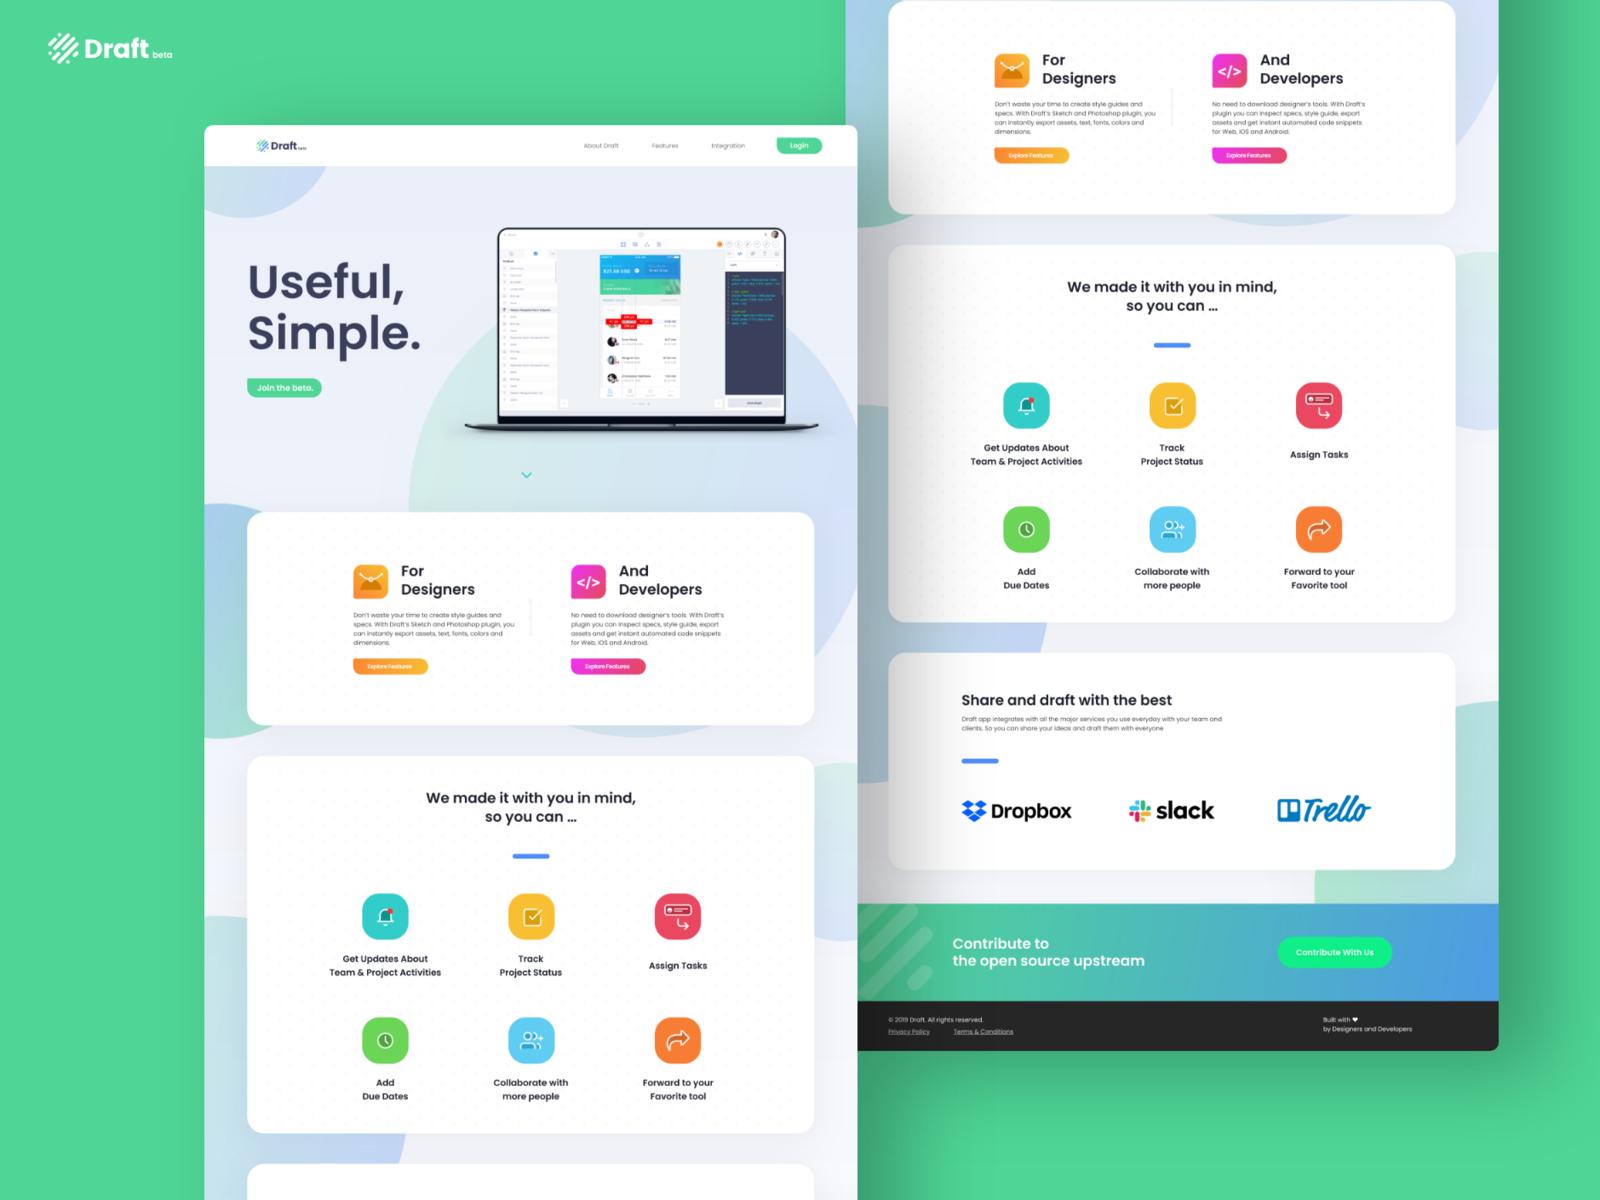 Draft App - Easy Design and Development Tool Landing! by